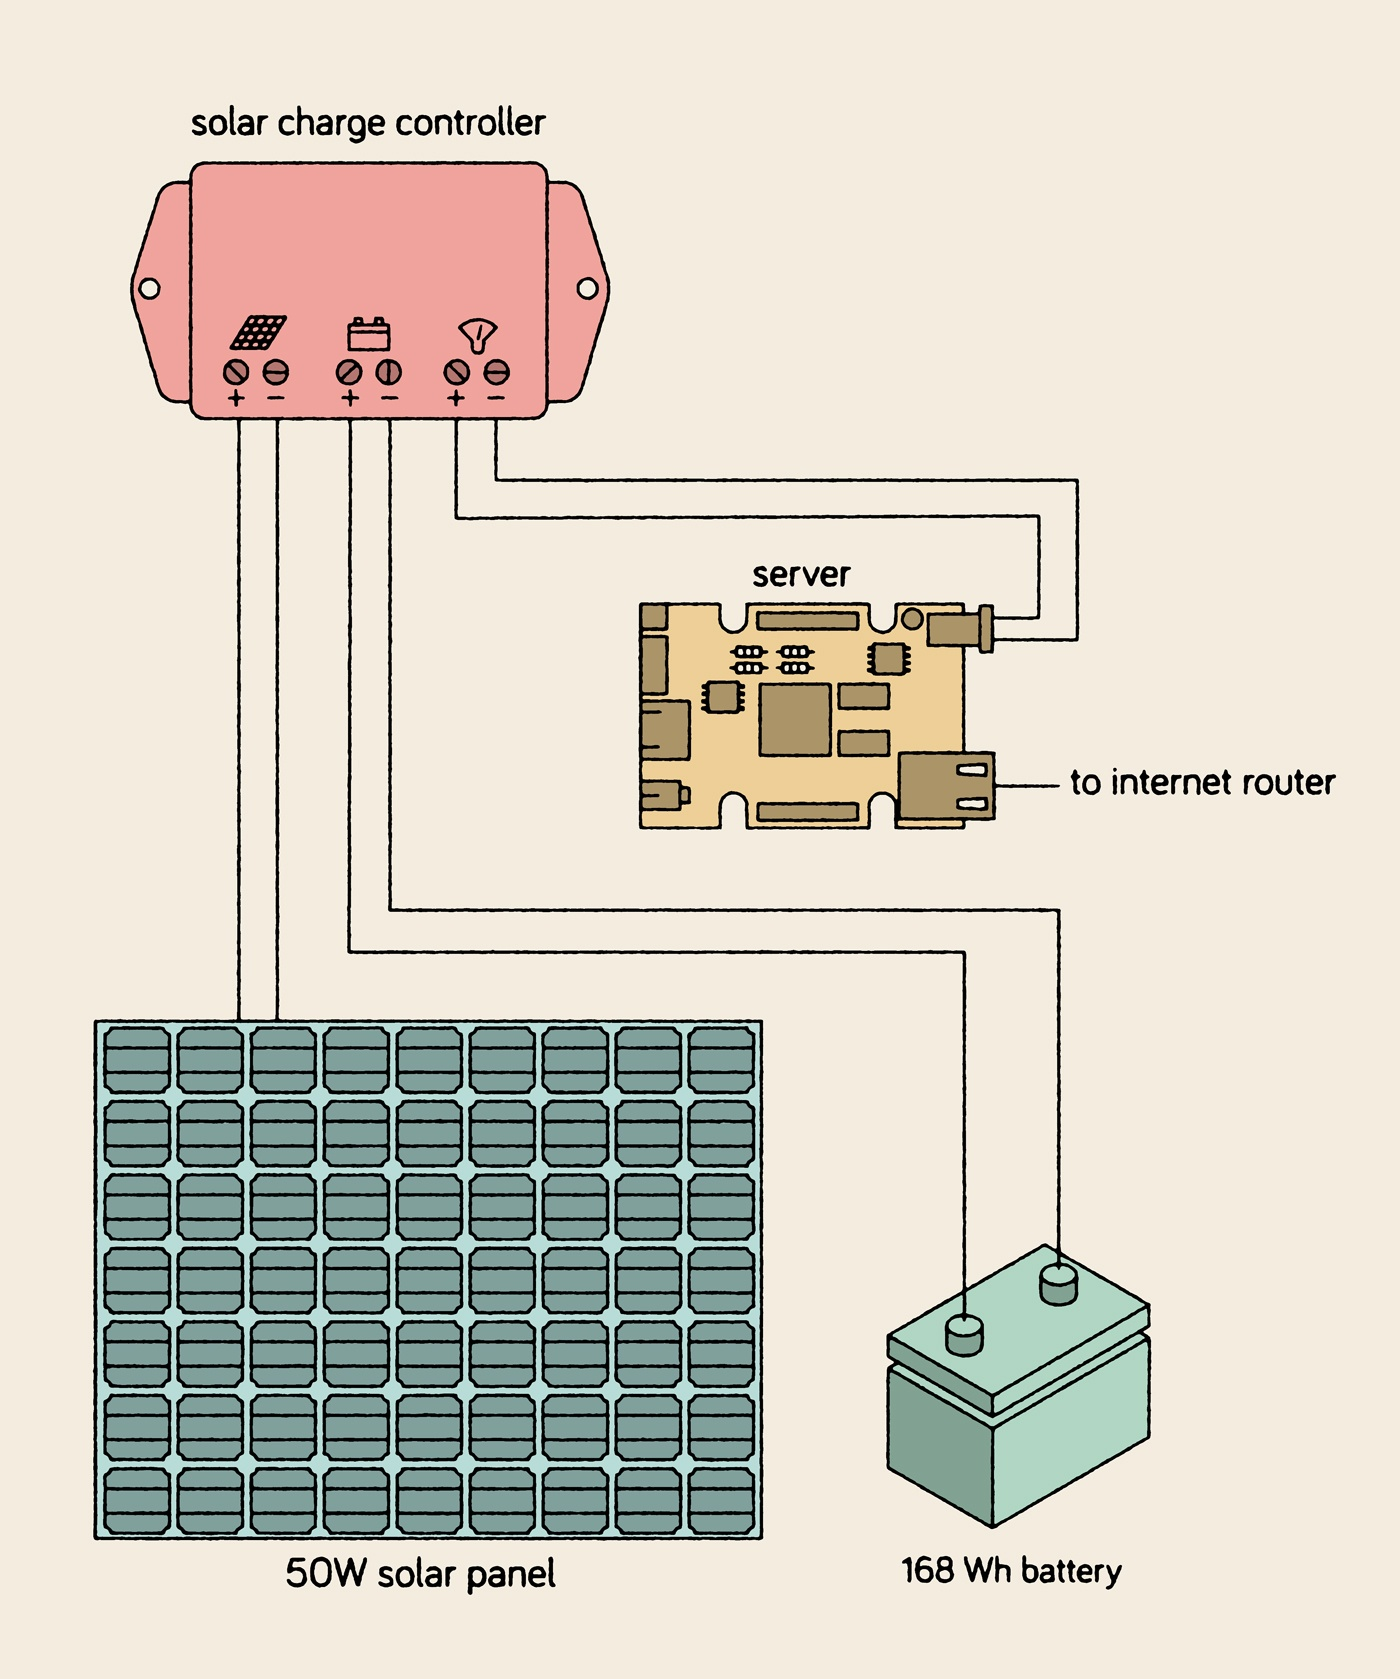 Домашний веб-сервер на солнечных батареях отработал 15 месяцев: аптайм 95,26% - 7